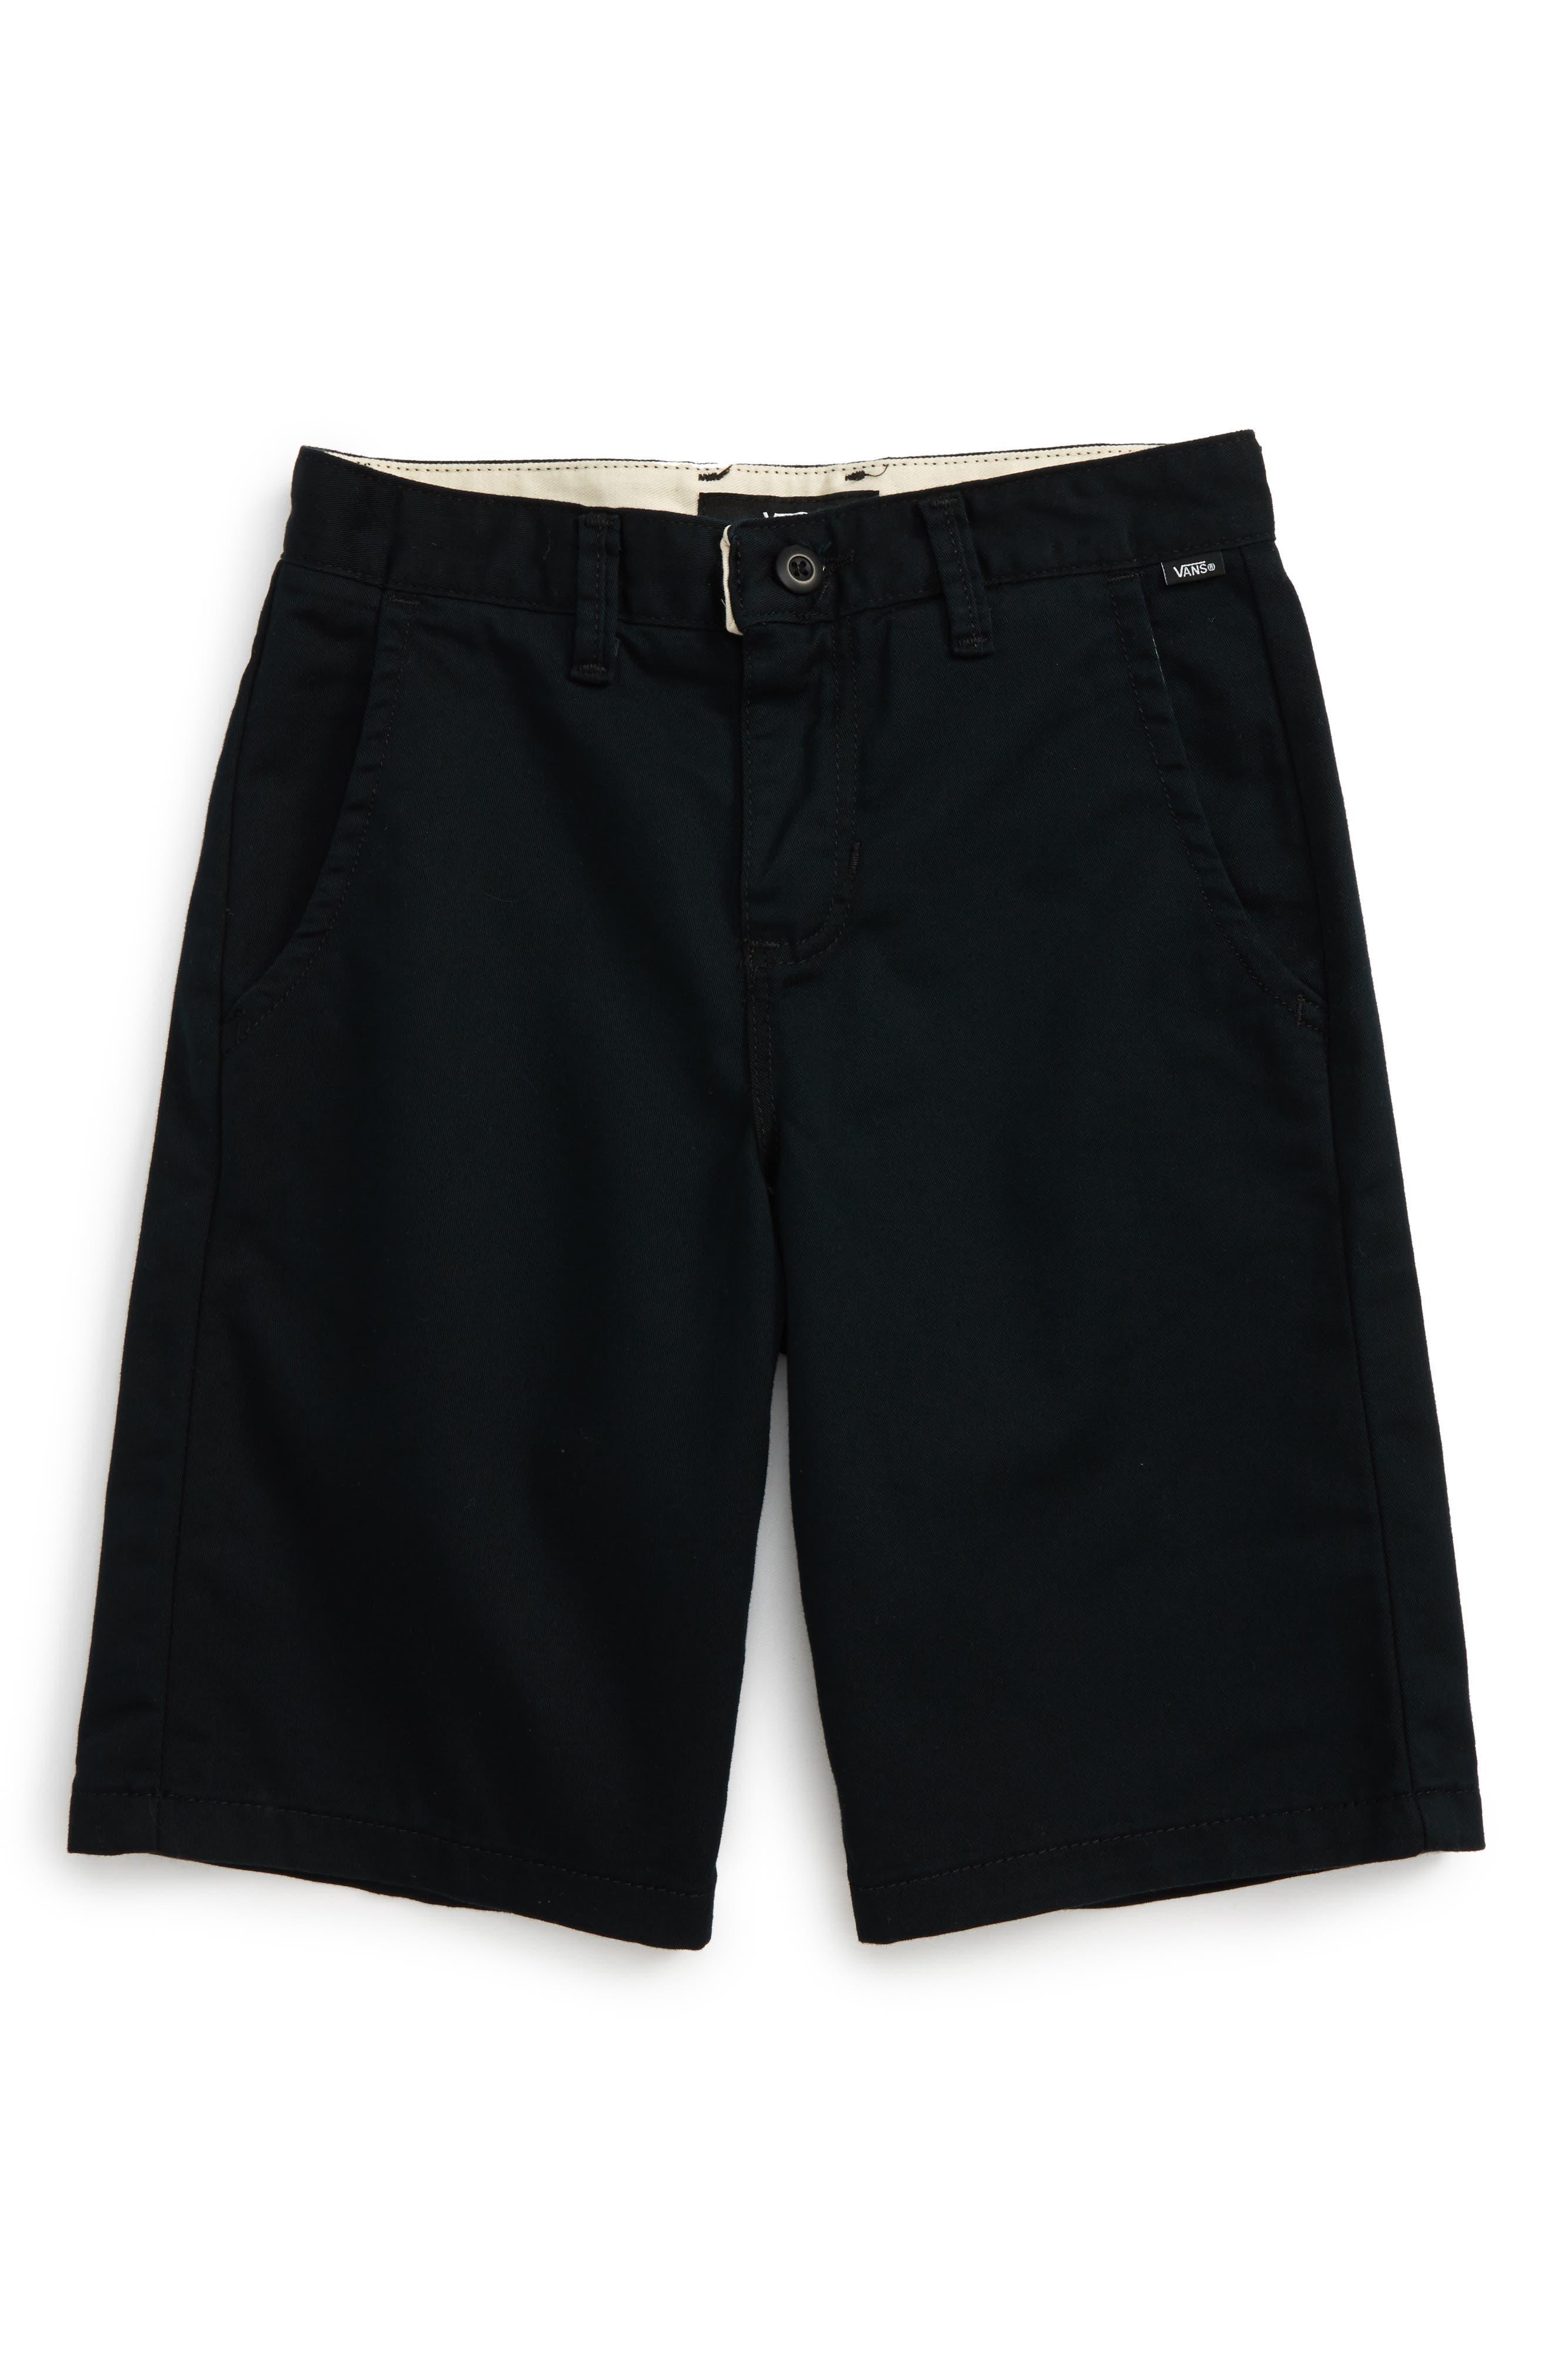 Main Image - Vans Authentic Walk Shorts (Big Boys)